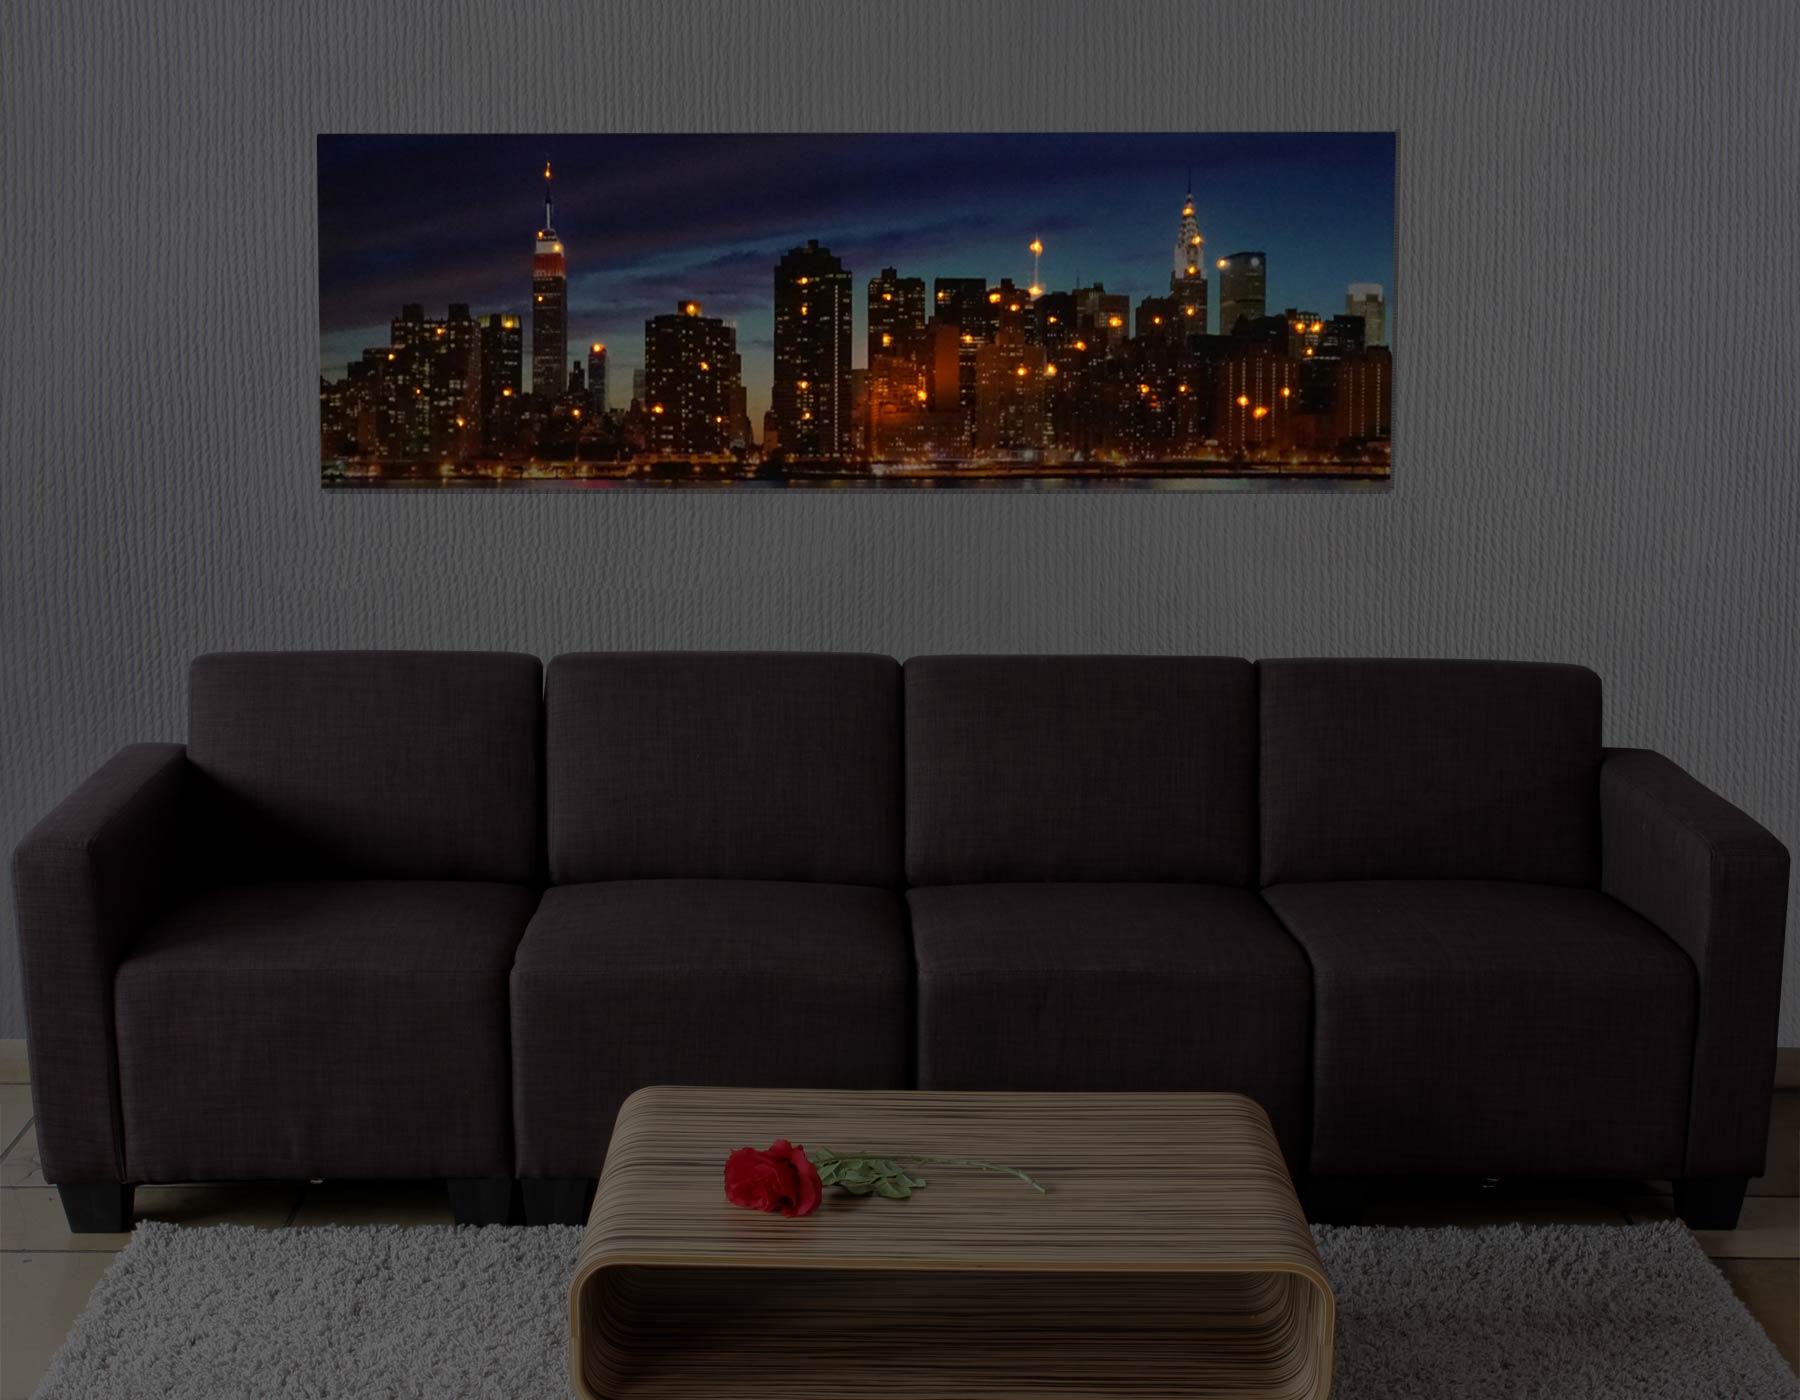 led bild mit beleuchtung leinwandbild leuchtbild motivbild timer flackernd ebay. Black Bedroom Furniture Sets. Home Design Ideas